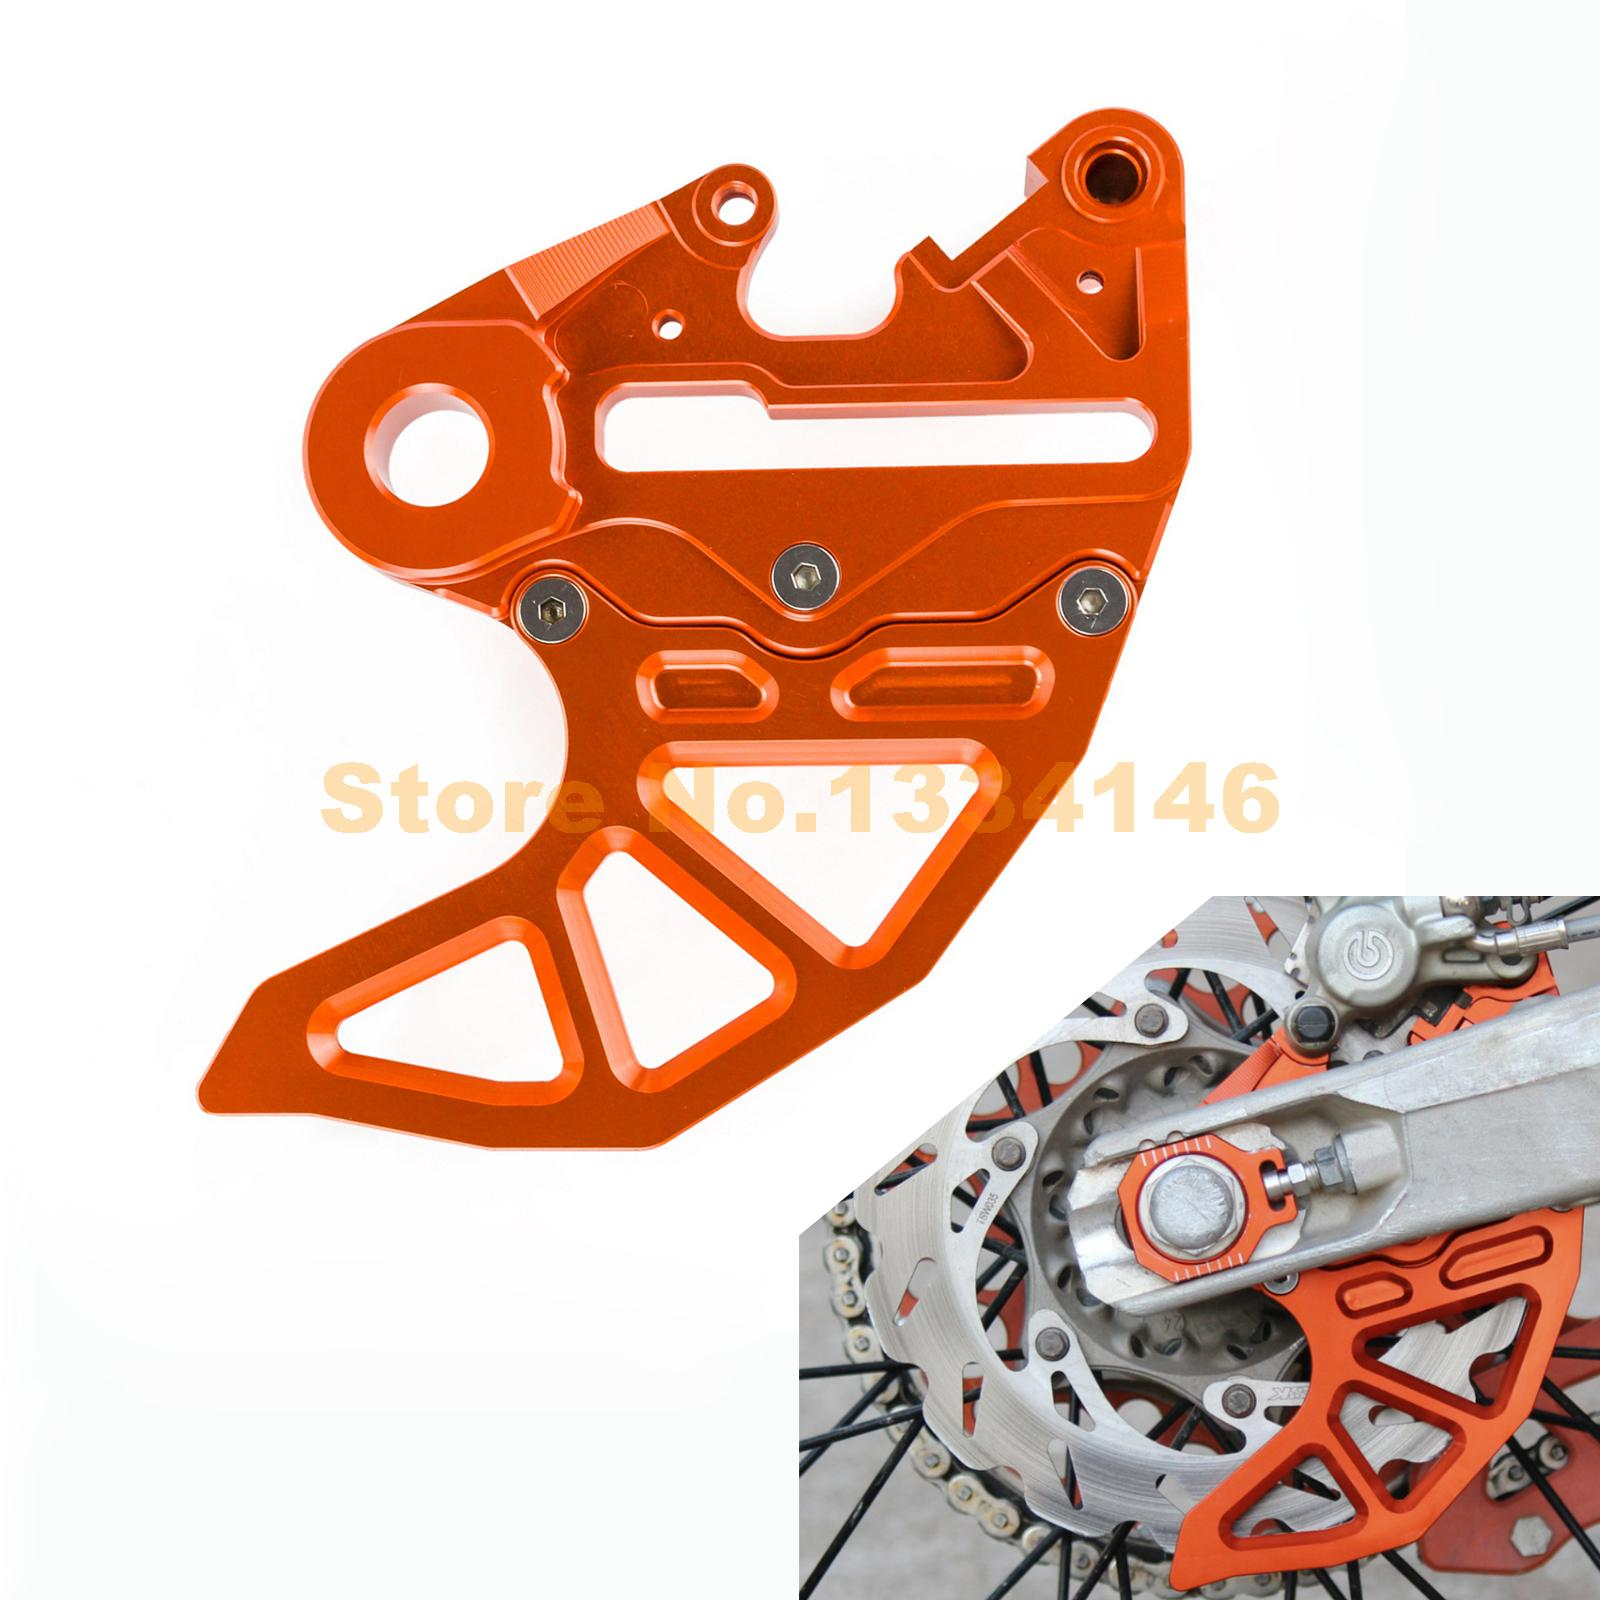 Brake Caliper Support Brake Disc Guard Fits For KTM 125 150 250 350 450 525 530